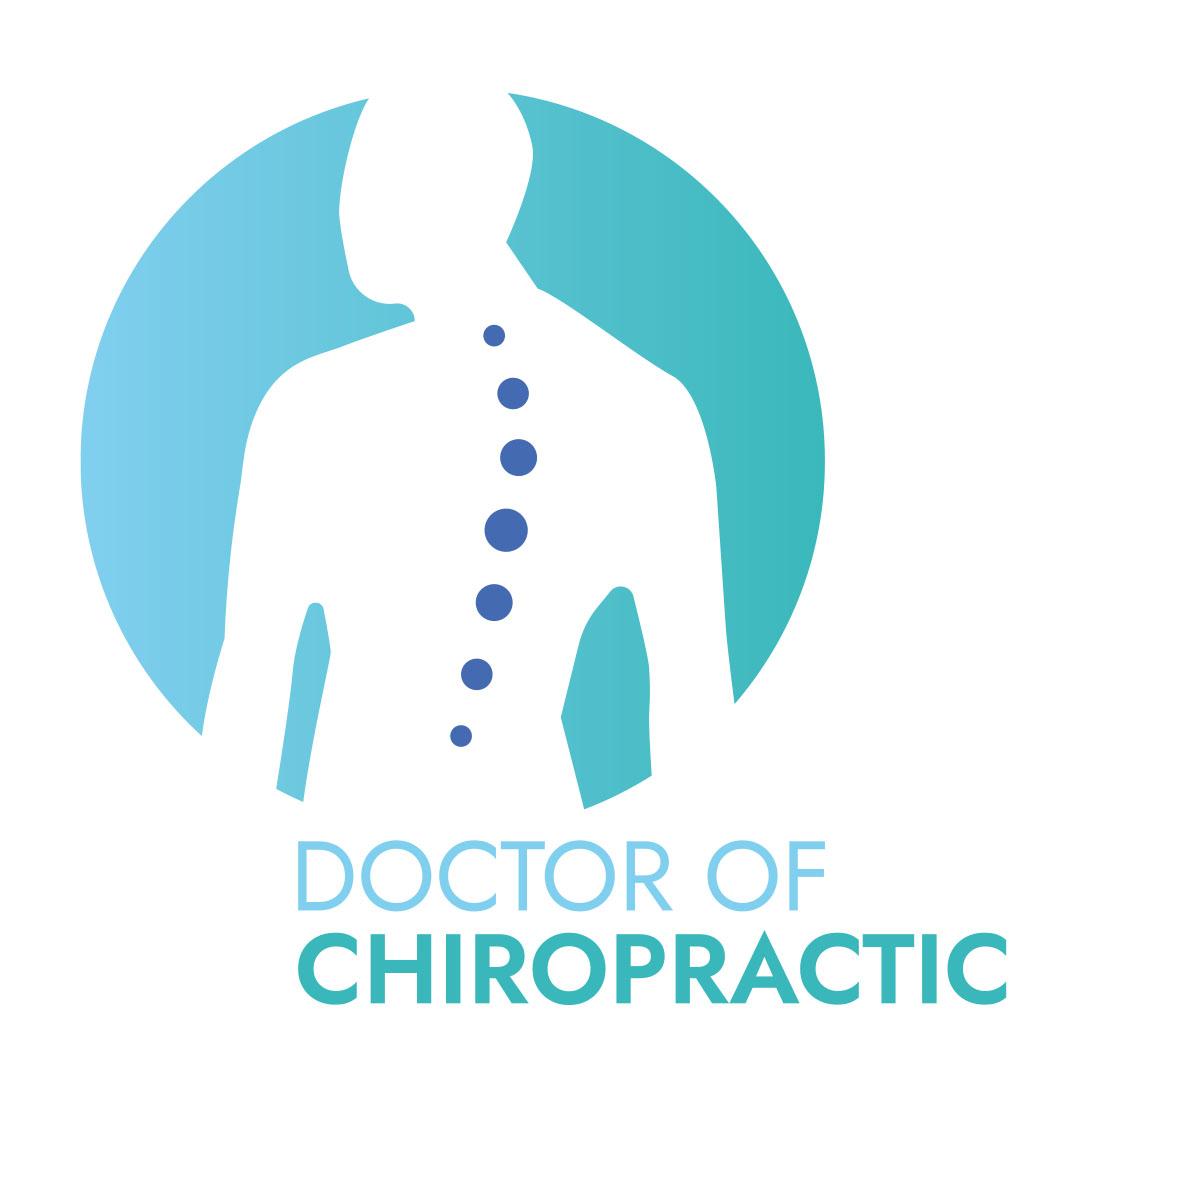 Doctor Of Chiropractic